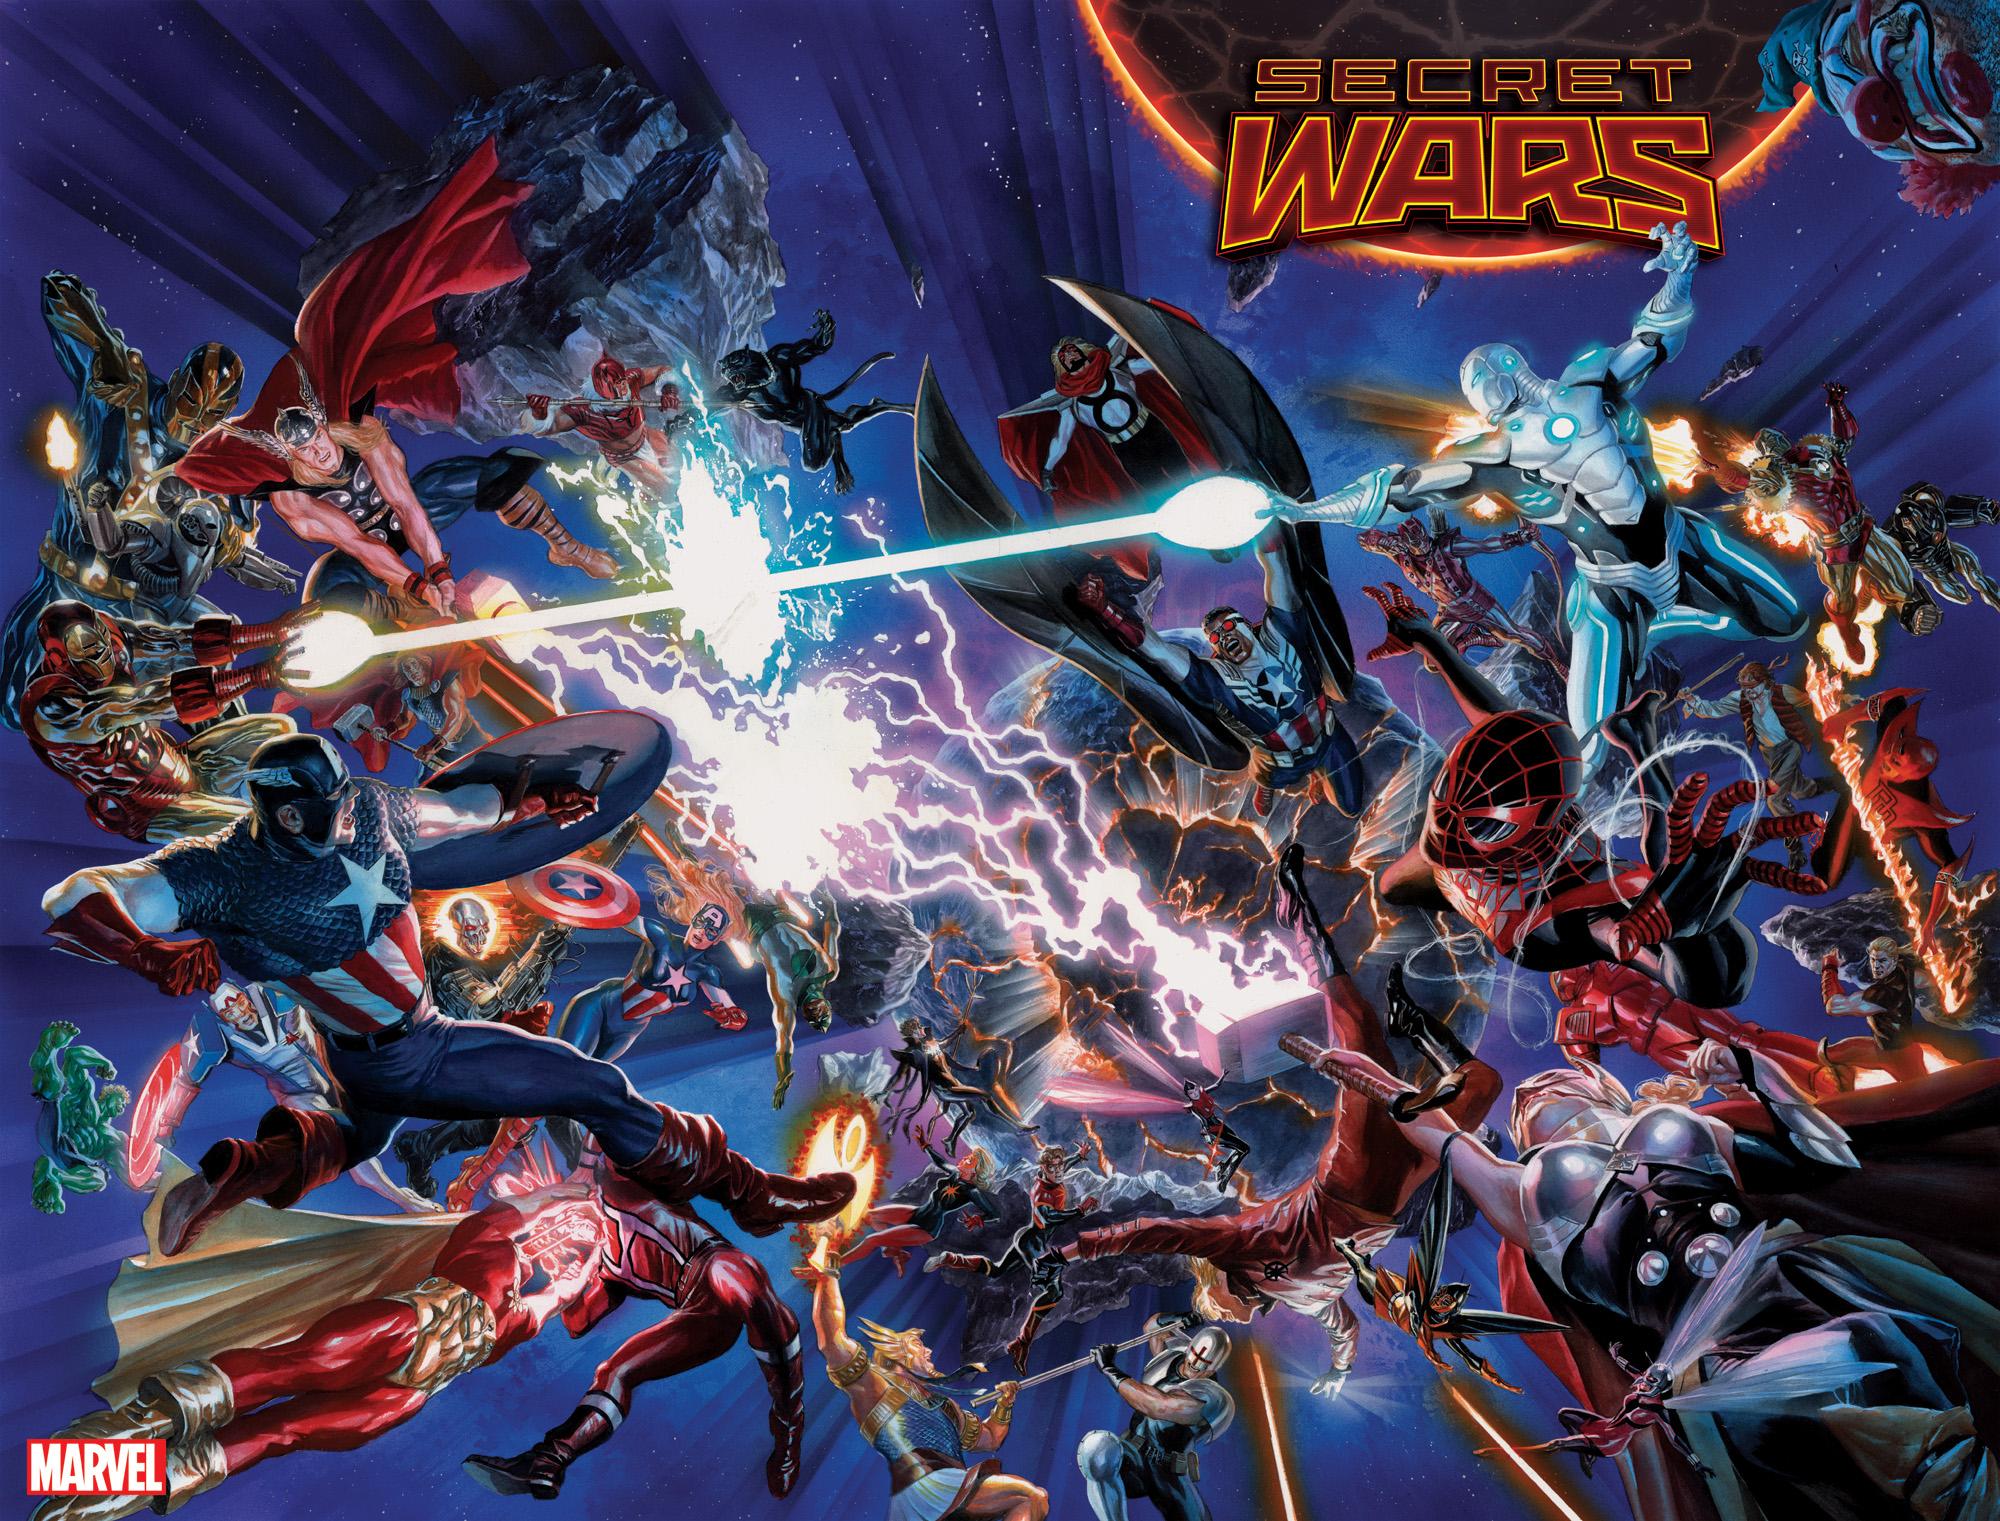 Top Wallpaper Marvel Secret Wars - 618008  Gallery_928563.jpg